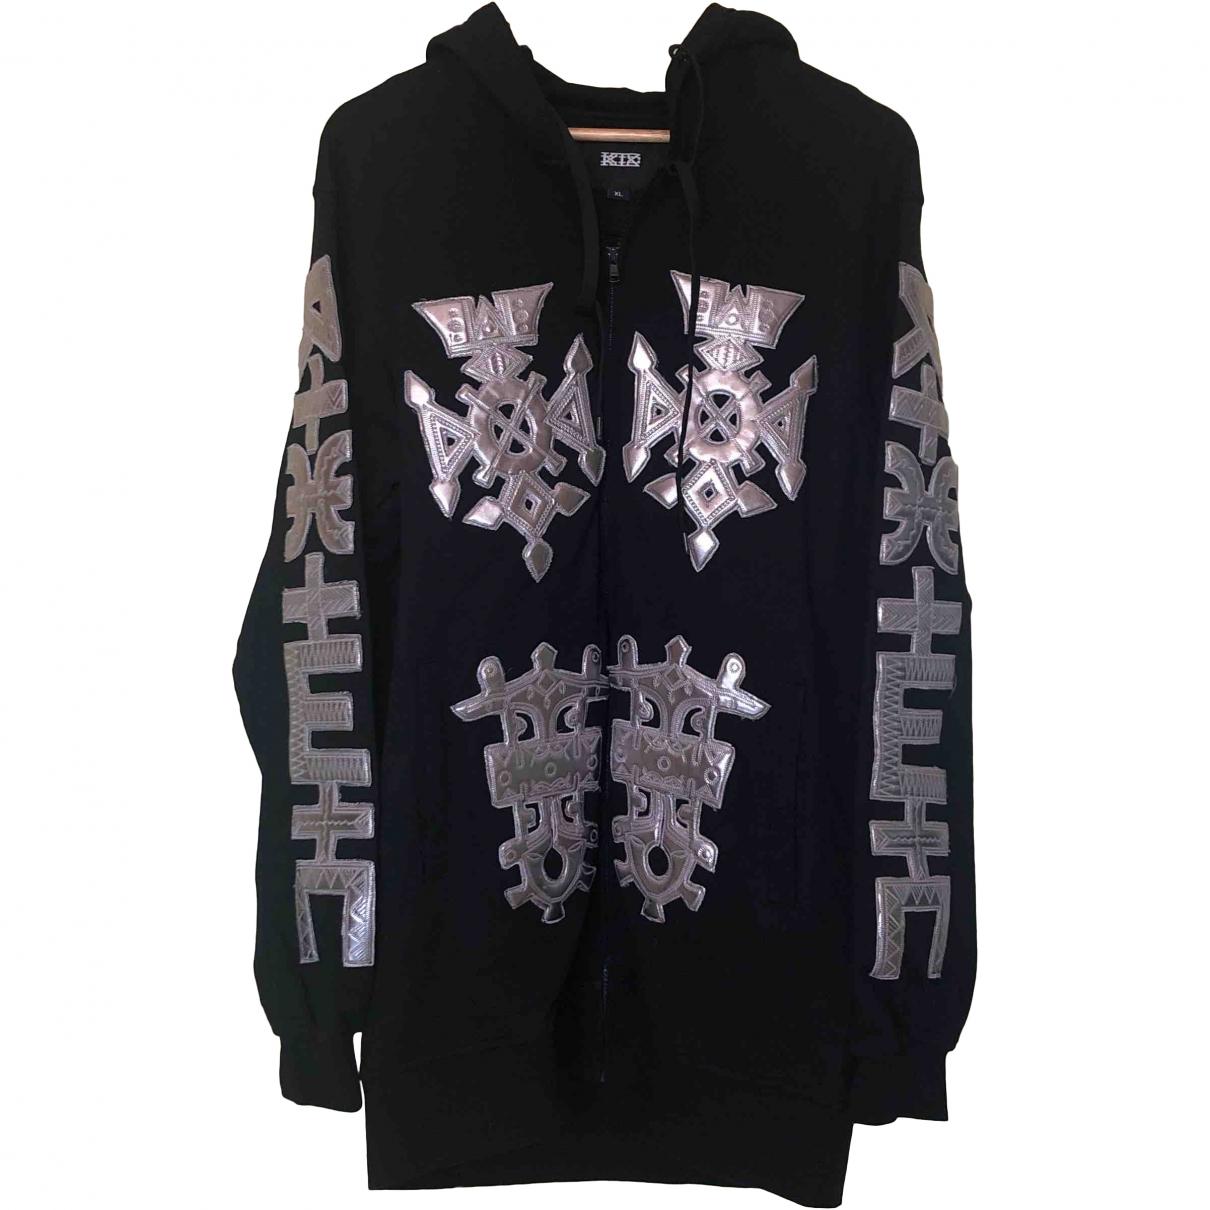 Ktz \N Black Cotton Knitwear & Sweatshirts for Men XL International